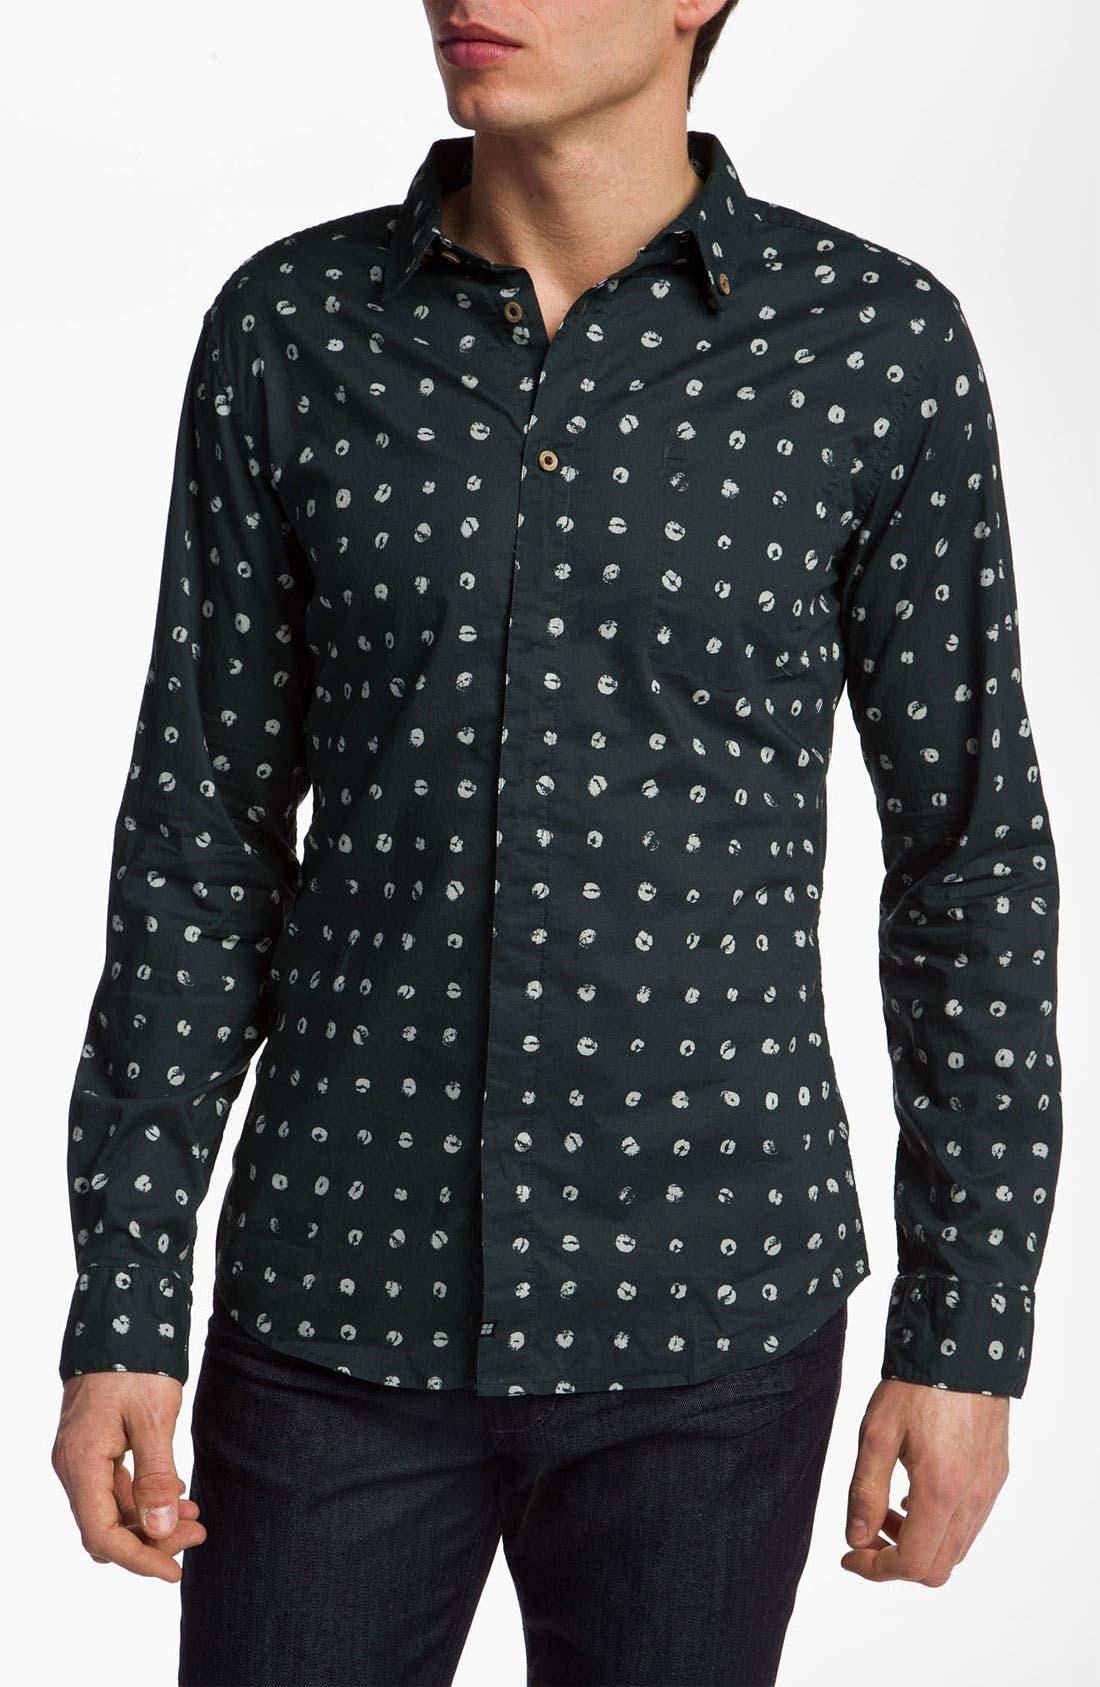 Alternate Image 1 Selected - Insight 'Poka Deth' Woven Shirt